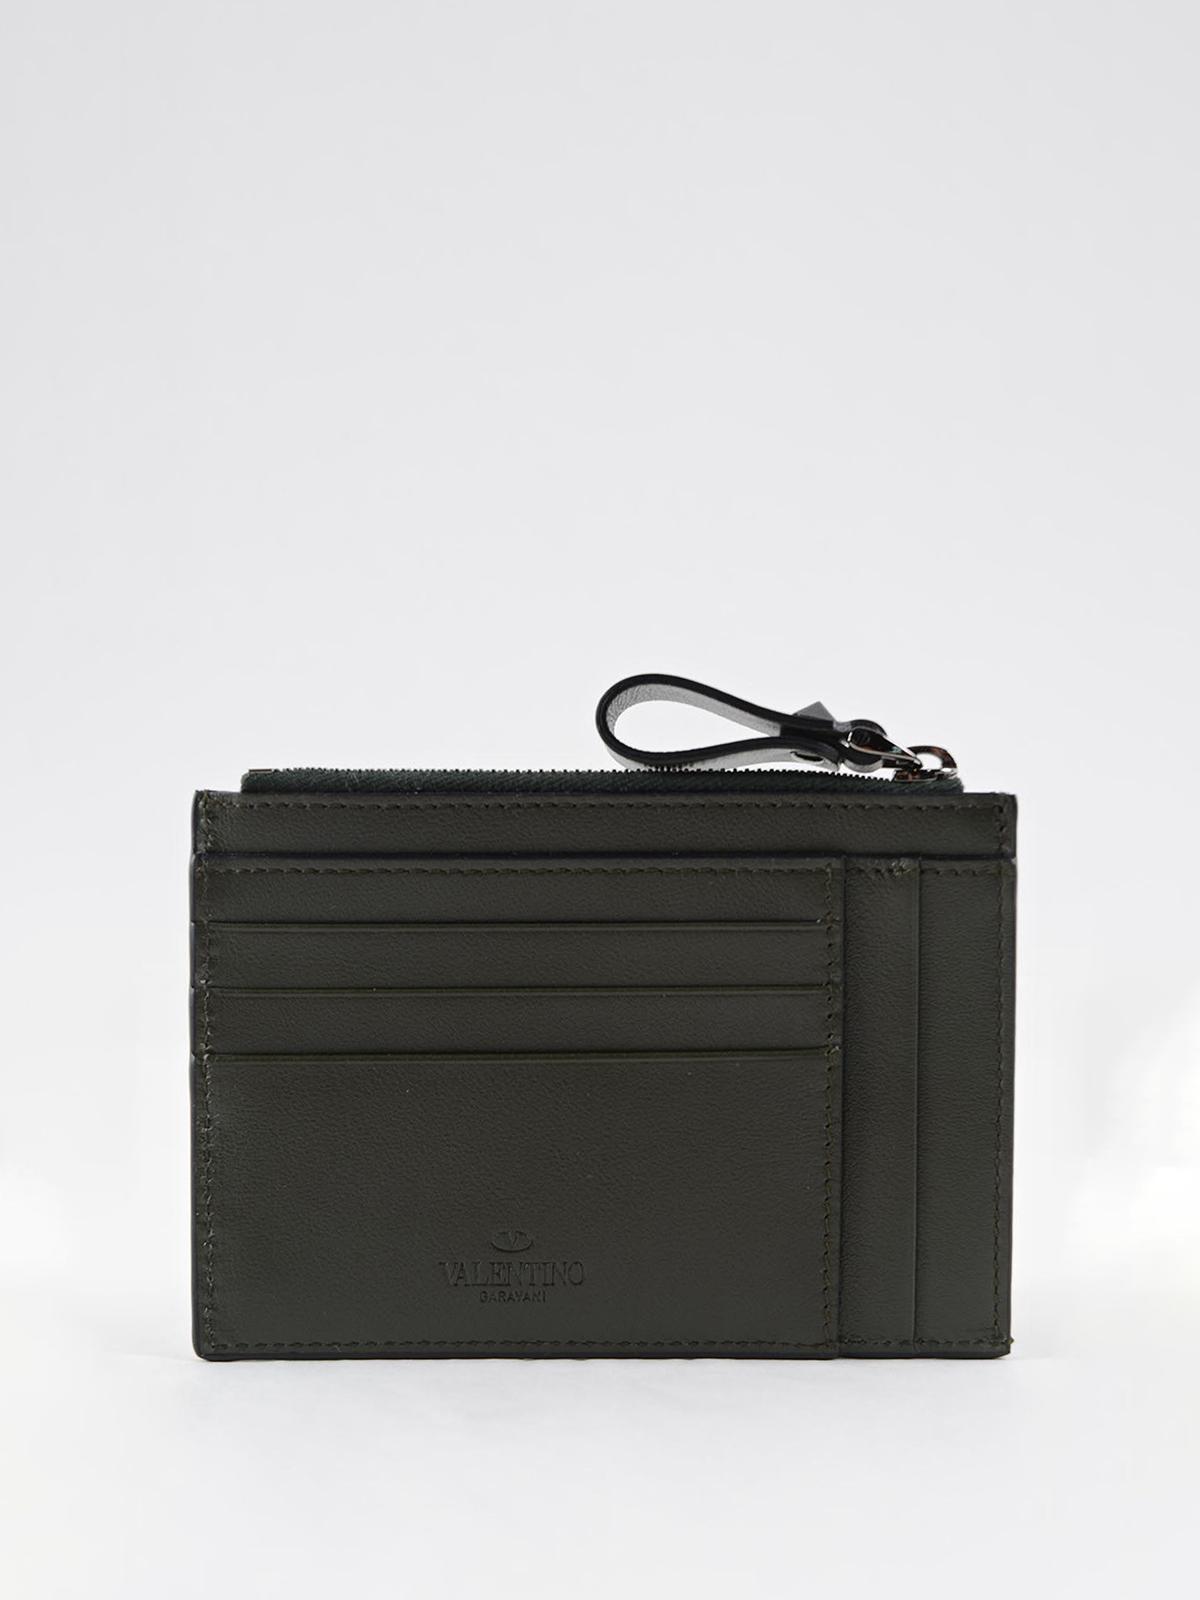 4c160fd05b8d7 iKRIX VALENTINO GARAVANI: wallets & purses - Studded detailed zipped card  holder